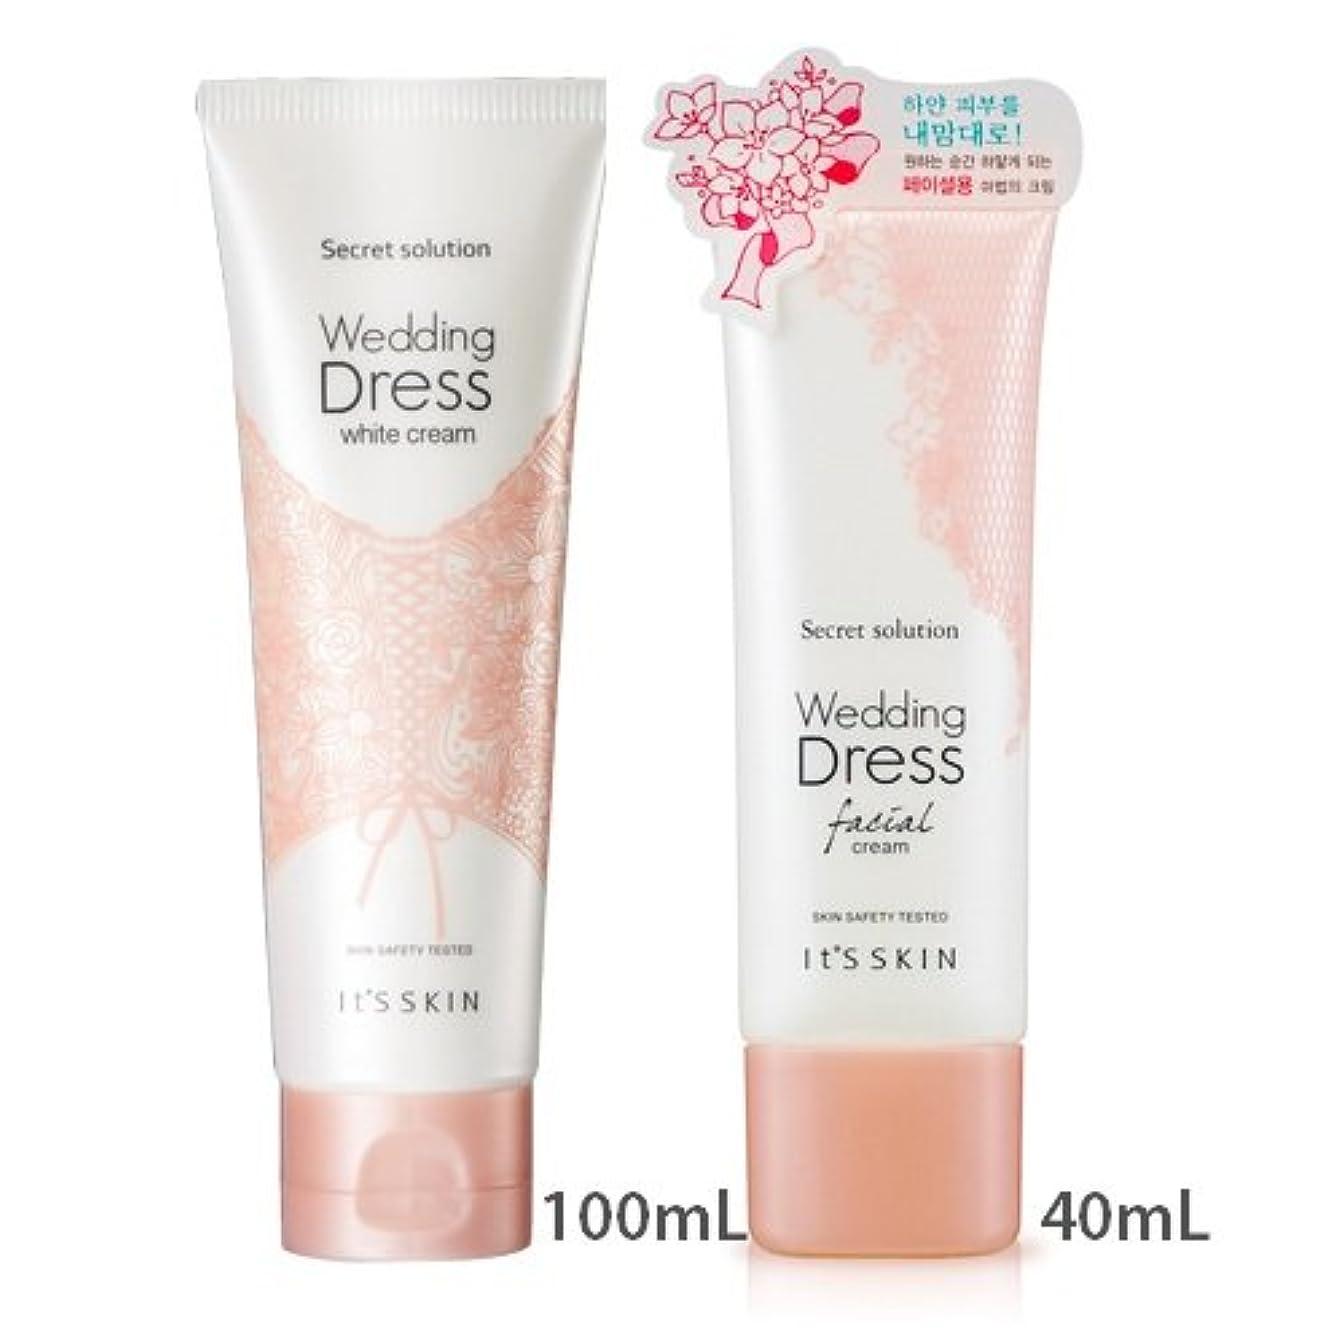 女優哲学博士静脈[1+1] It's skin Secret Solution Wedding Dress Facial Cream 40mL + Secret Solution Wedding Dress Cream 100mL イッツスキン...